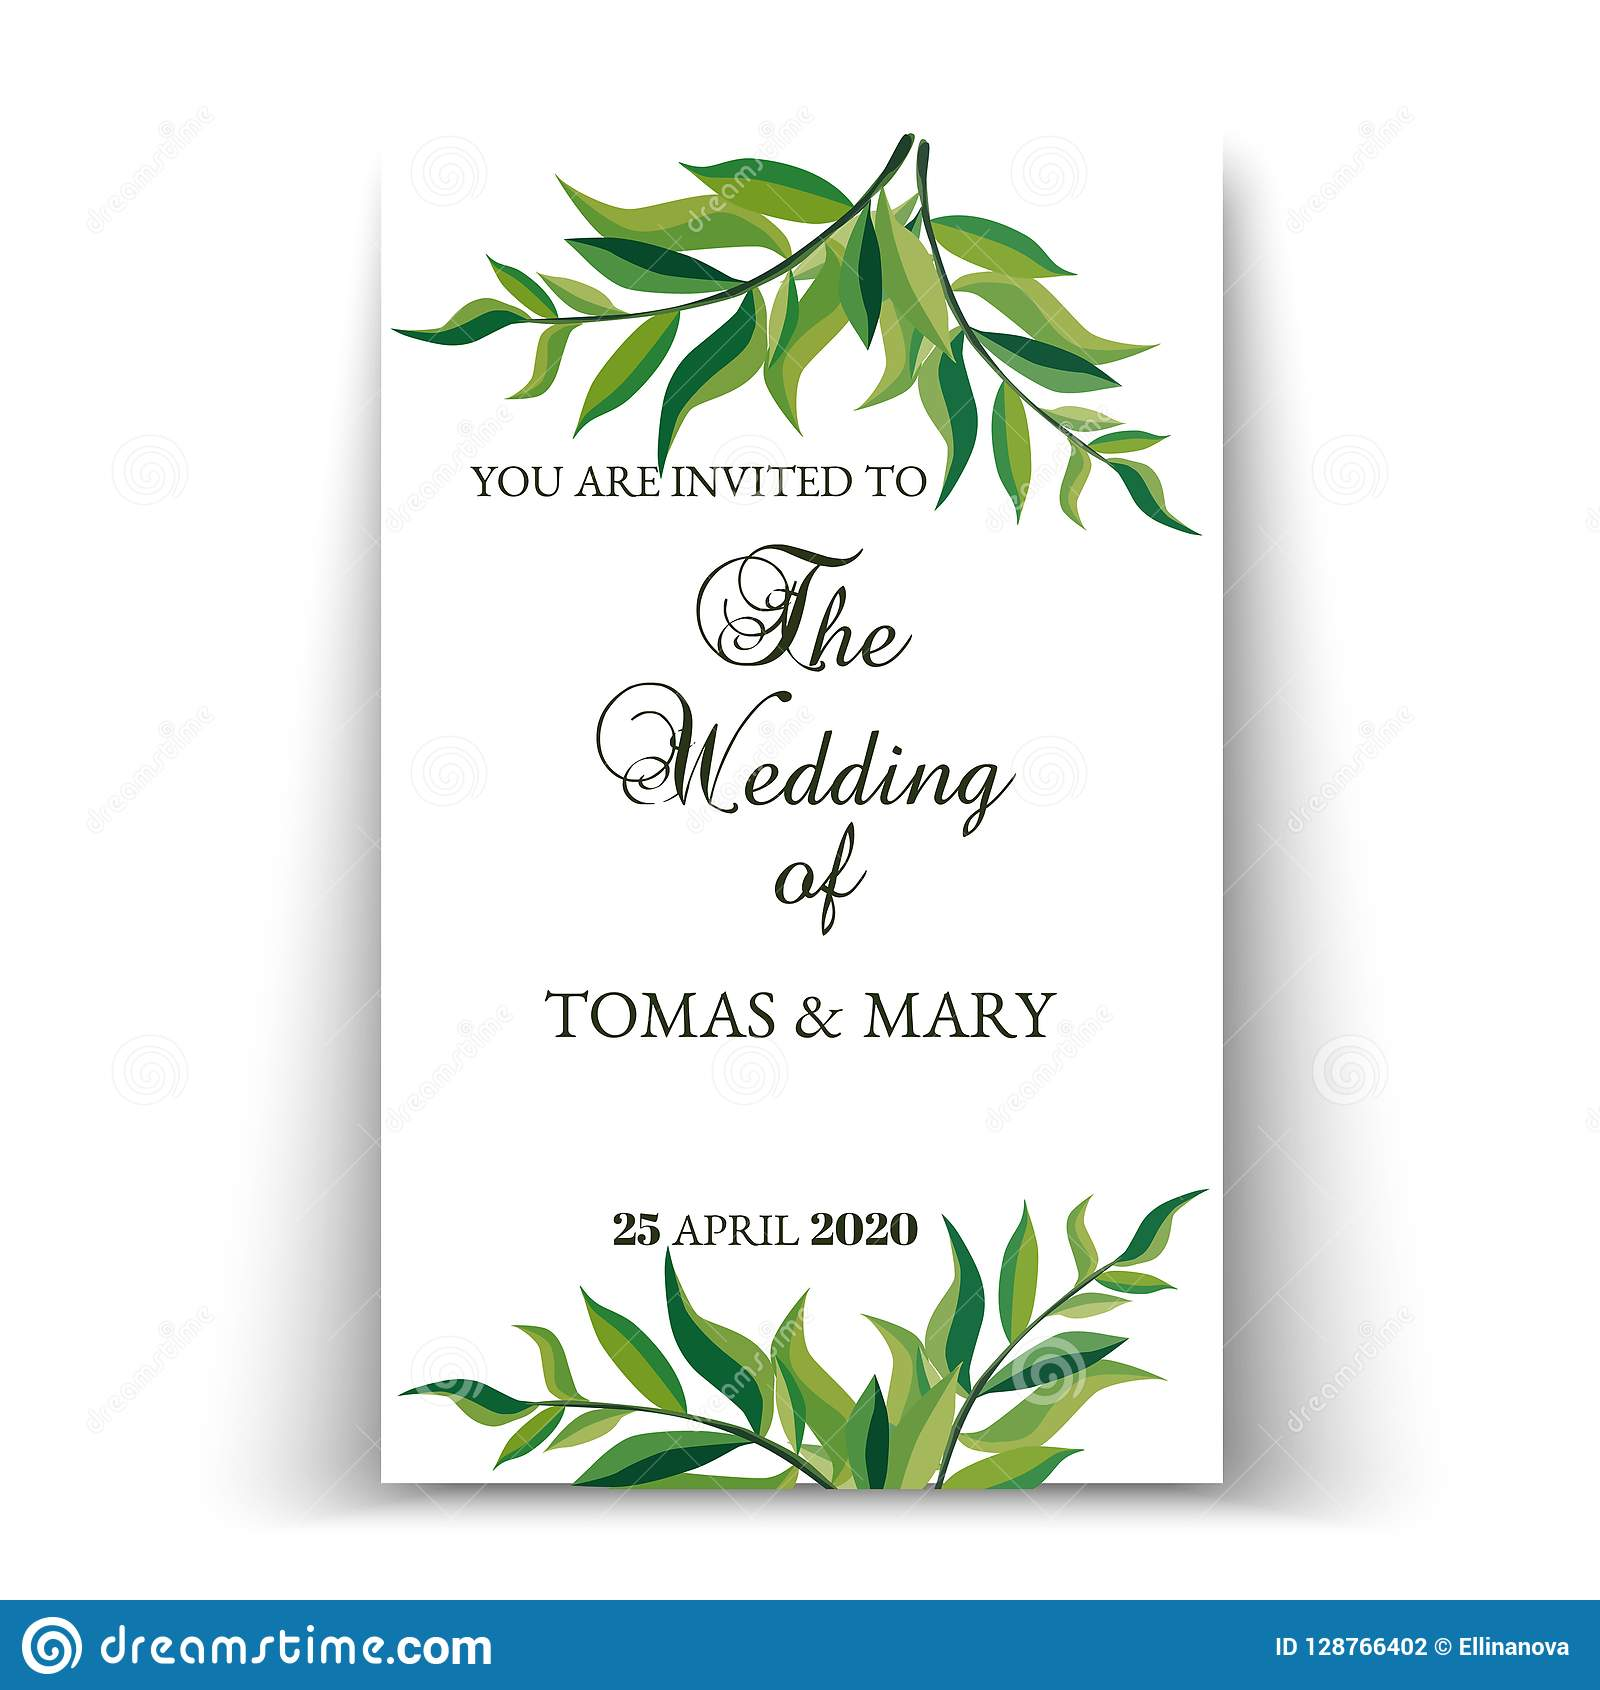 greenery wedding invitation template stock vector illustration of